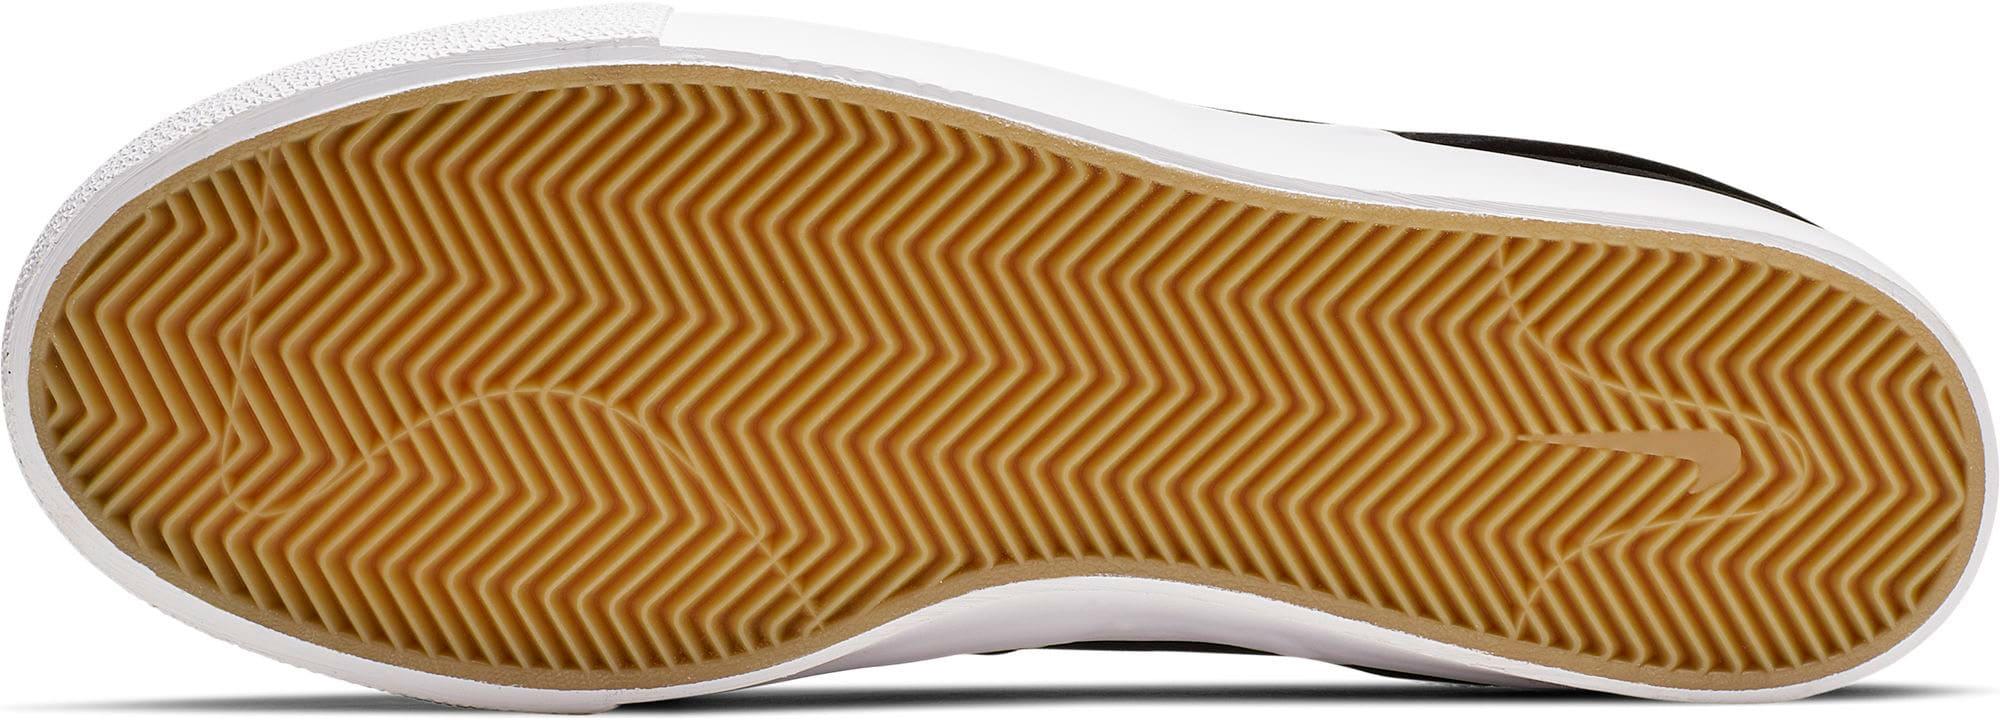 on sale 4633d 7b984 Nike SB Zoom Stefan Janoski Slip RM Skate Shoes - thumbnail 6